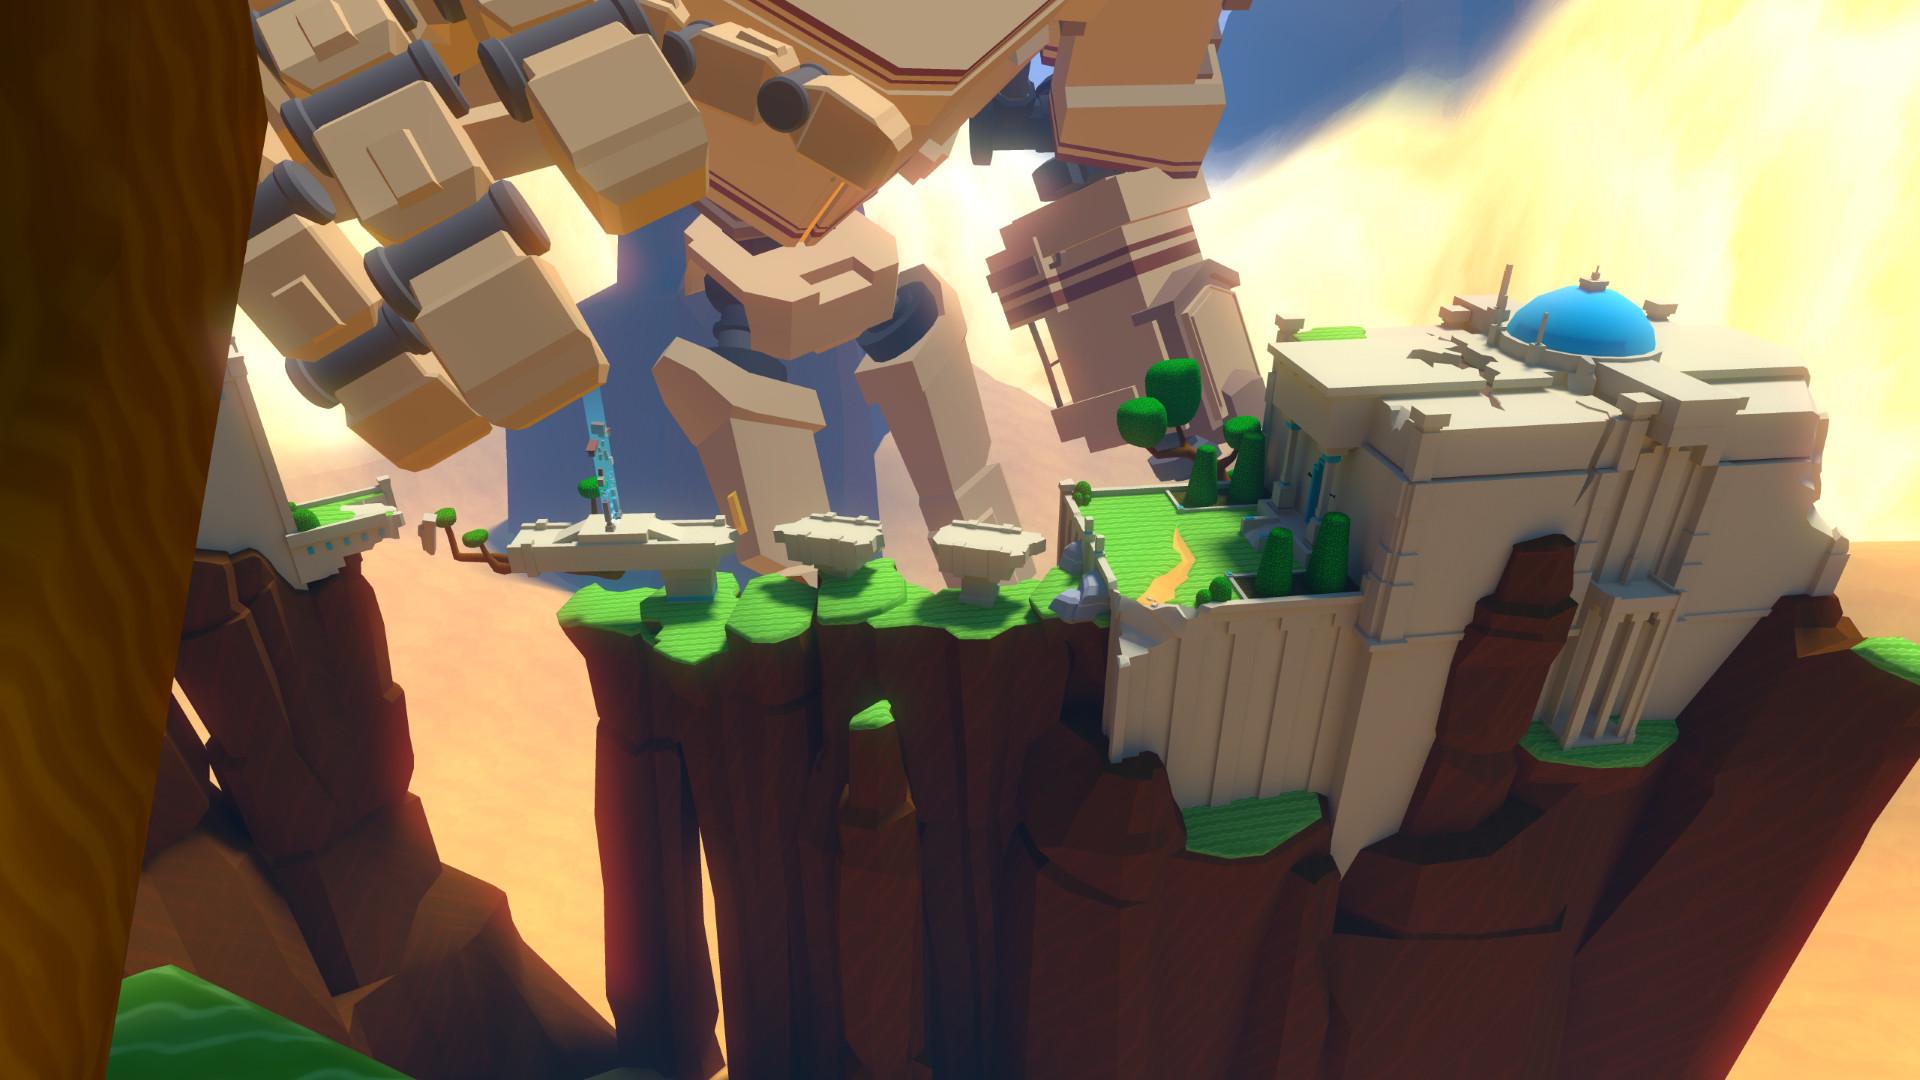 Oculus Quest 游戏《Windlands VR》御风飞行插图(3)